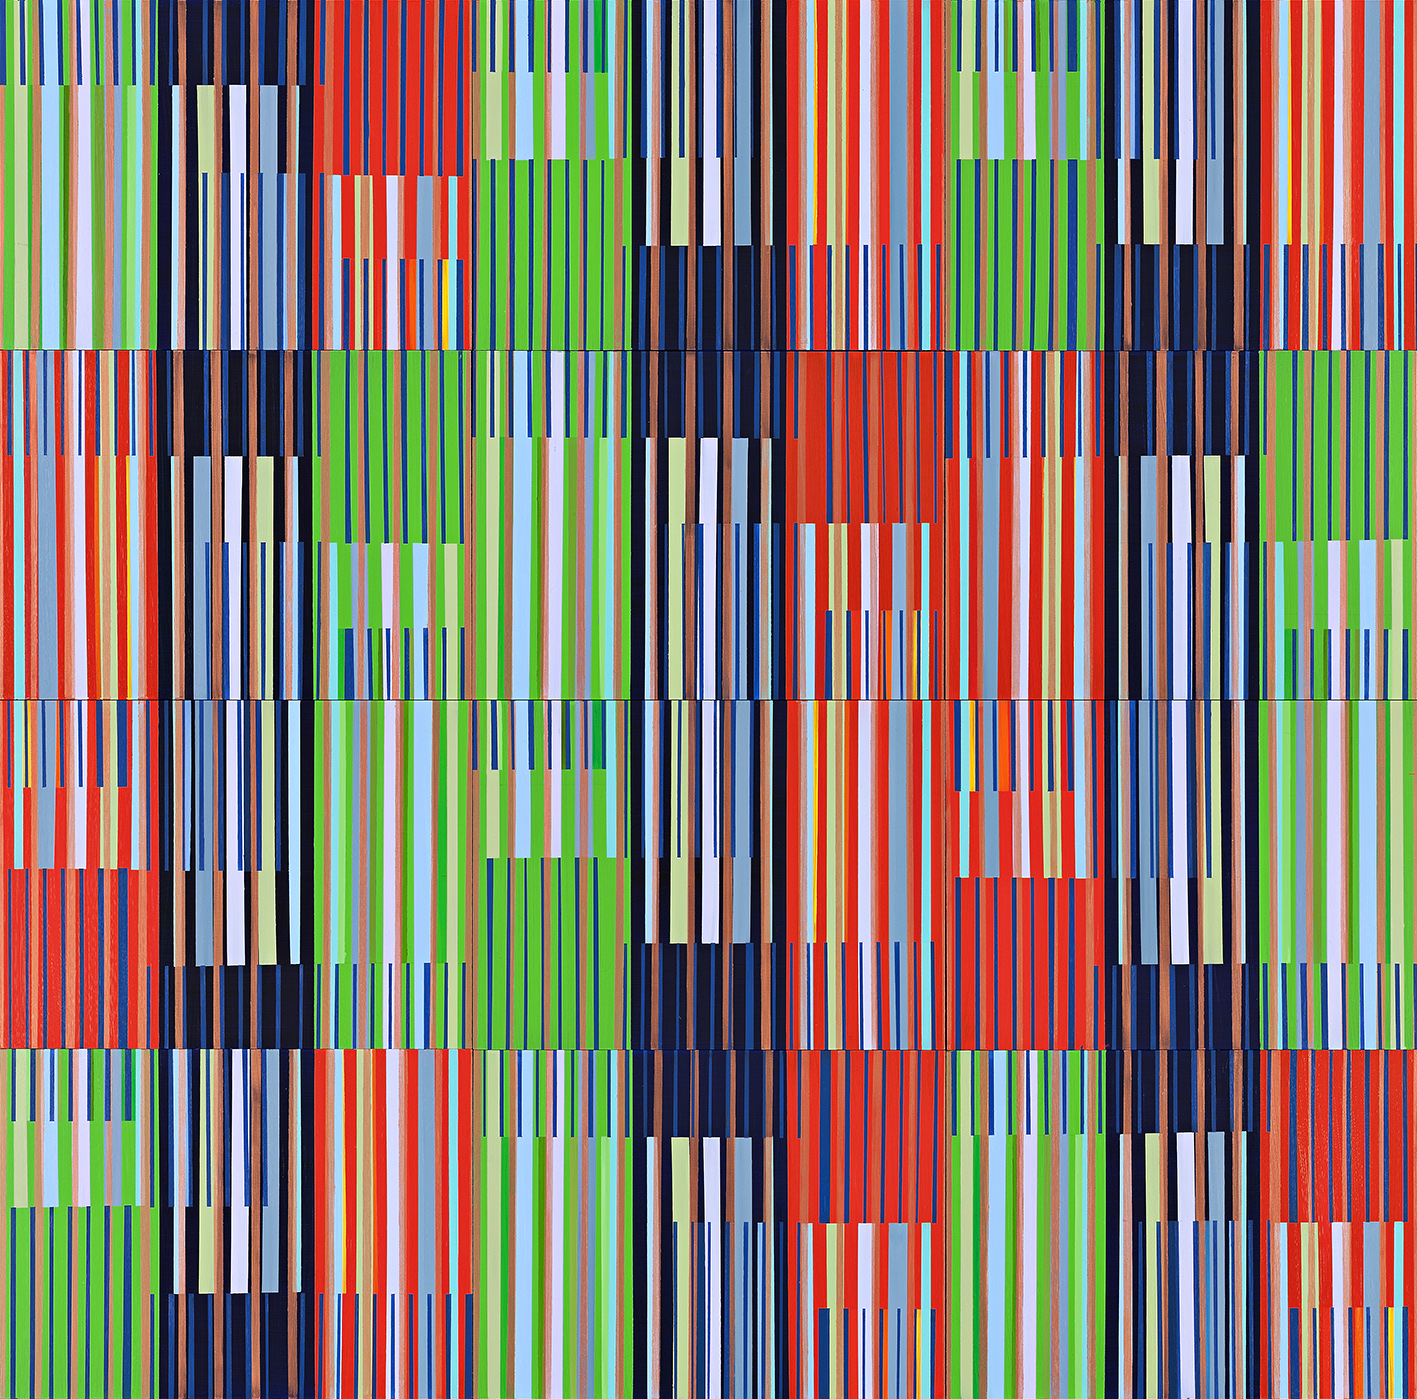 12 Panel Stripe Oil on Board 180cm x 180cm